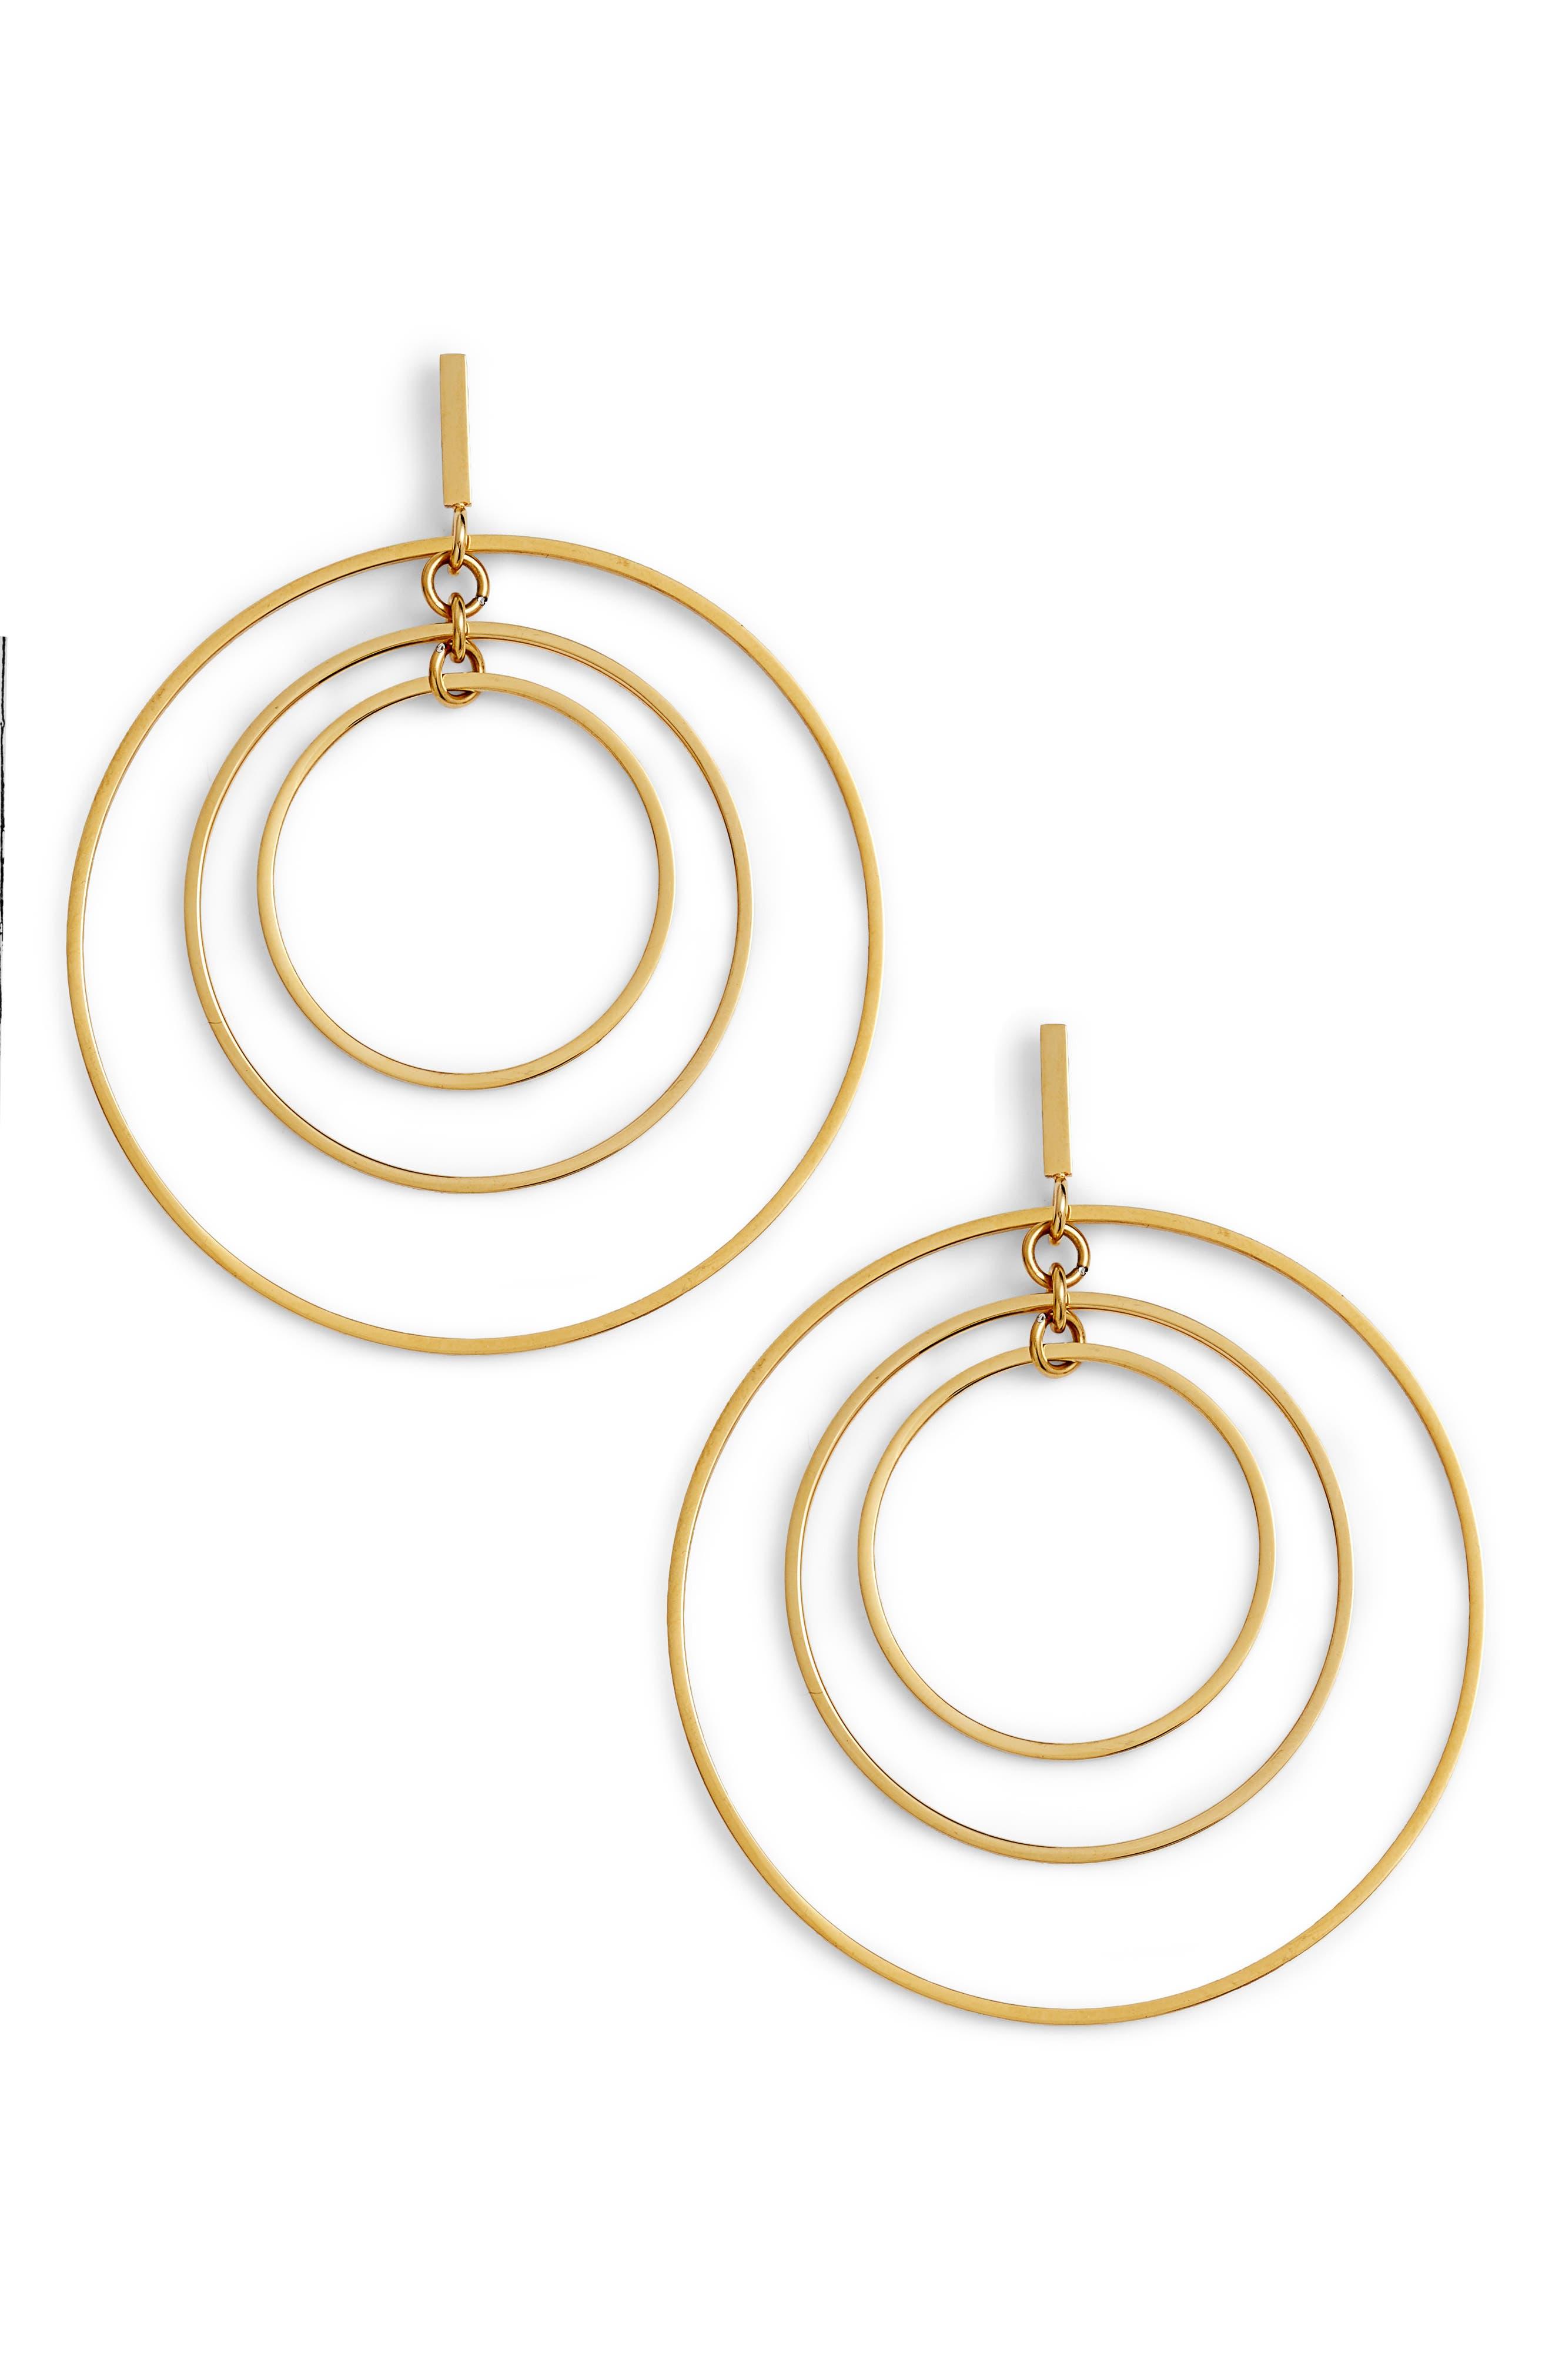 Wire Hoop Earrings,                             Main thumbnail 1, color,                             710